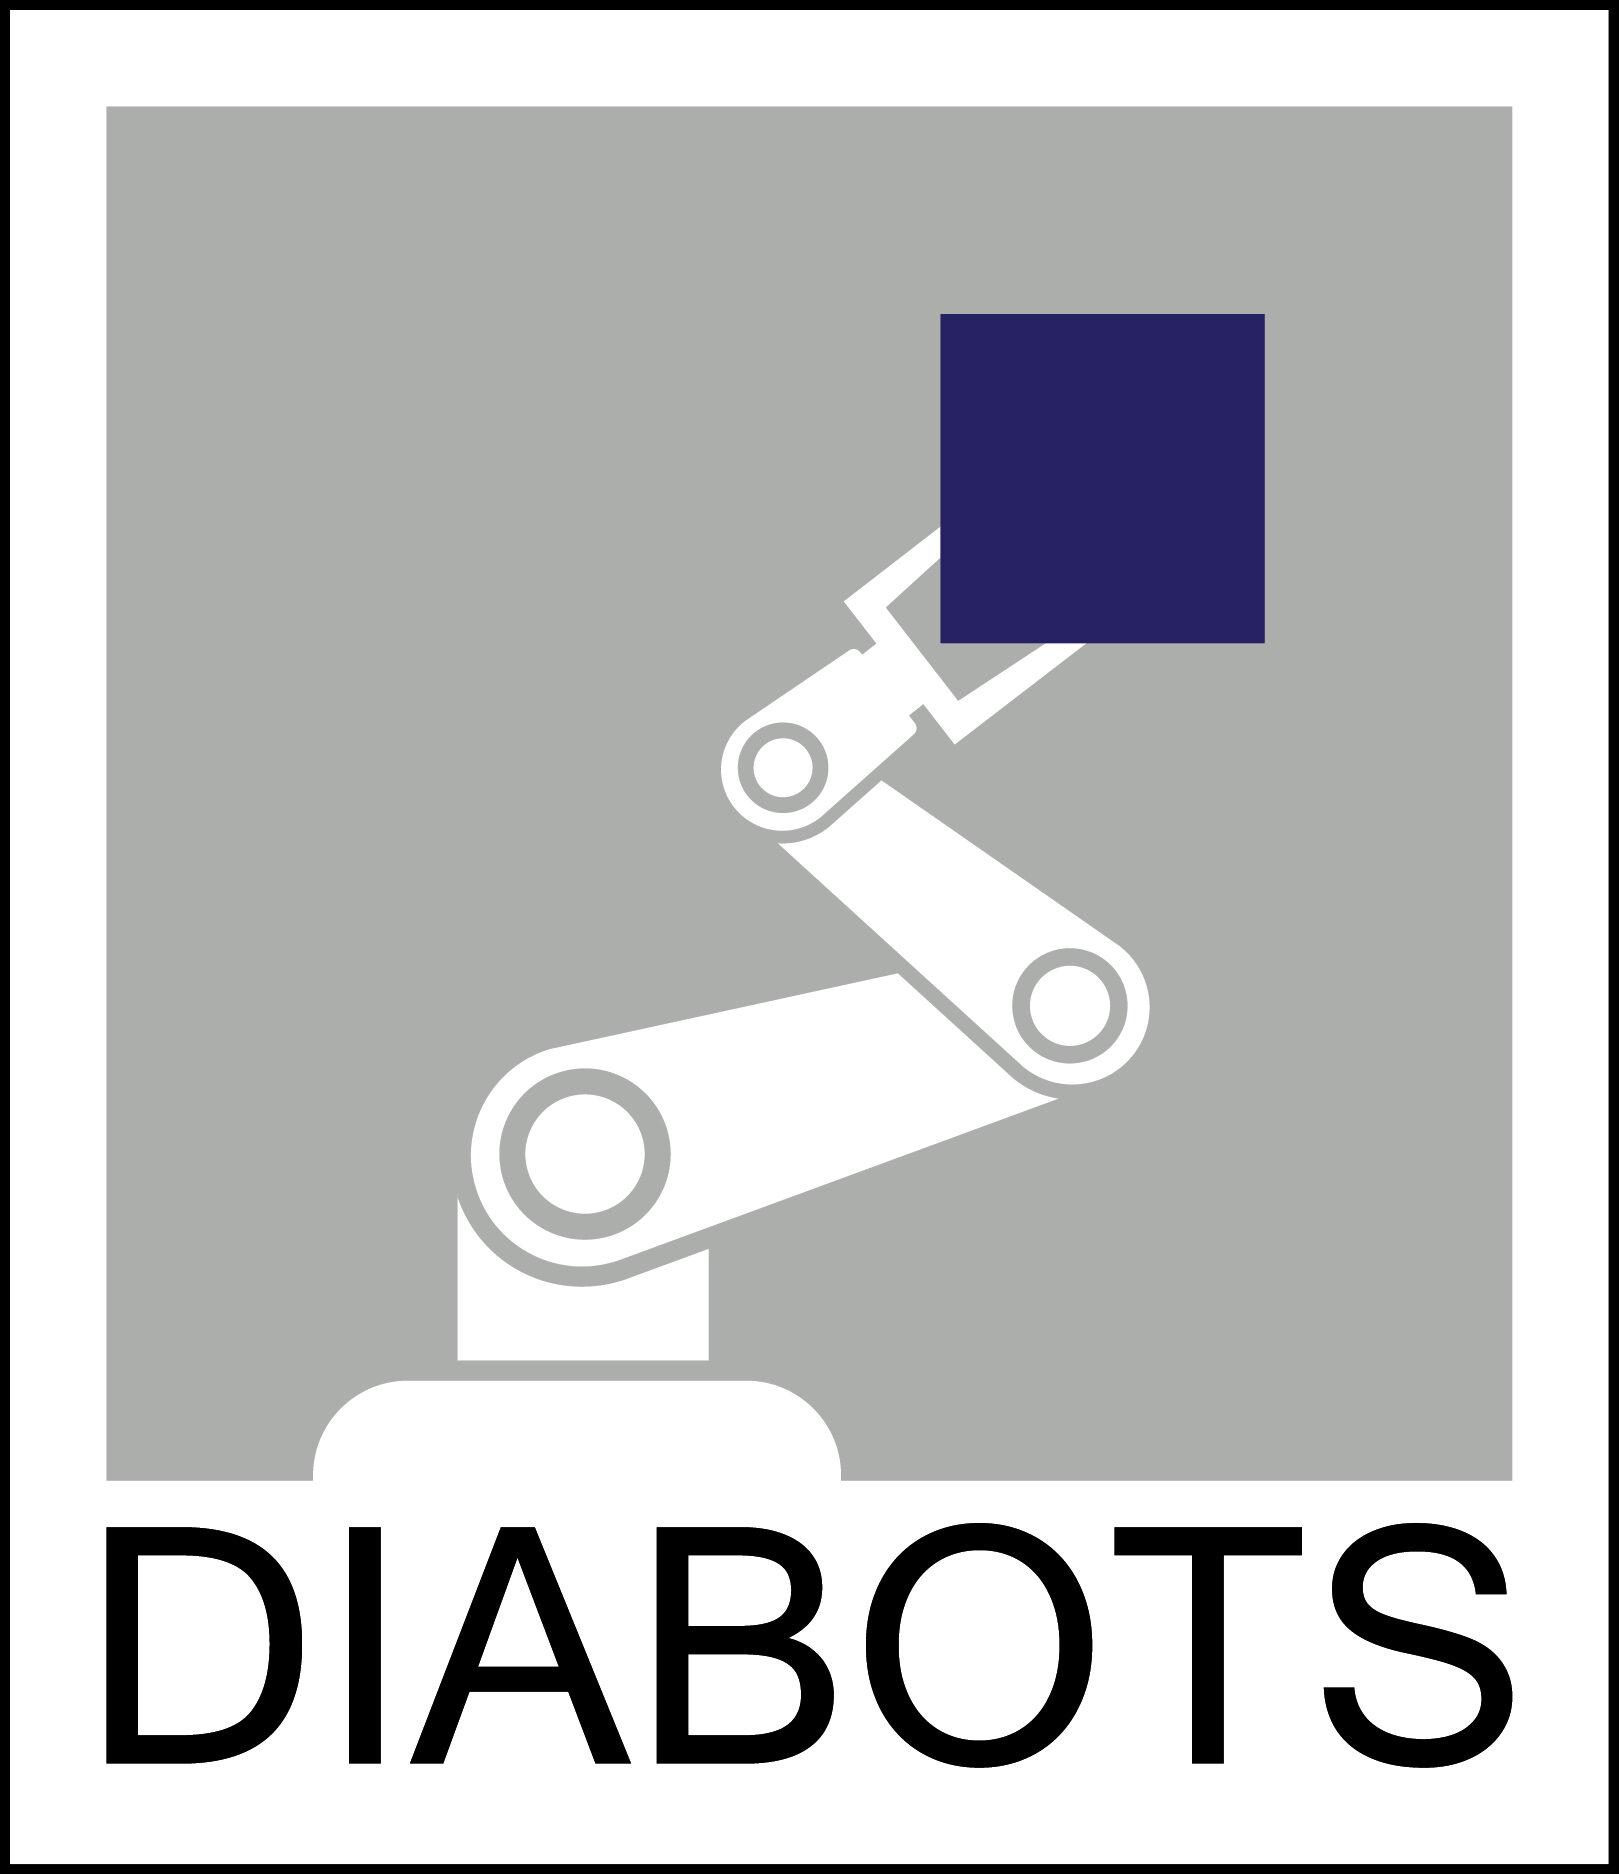 DIABOTS